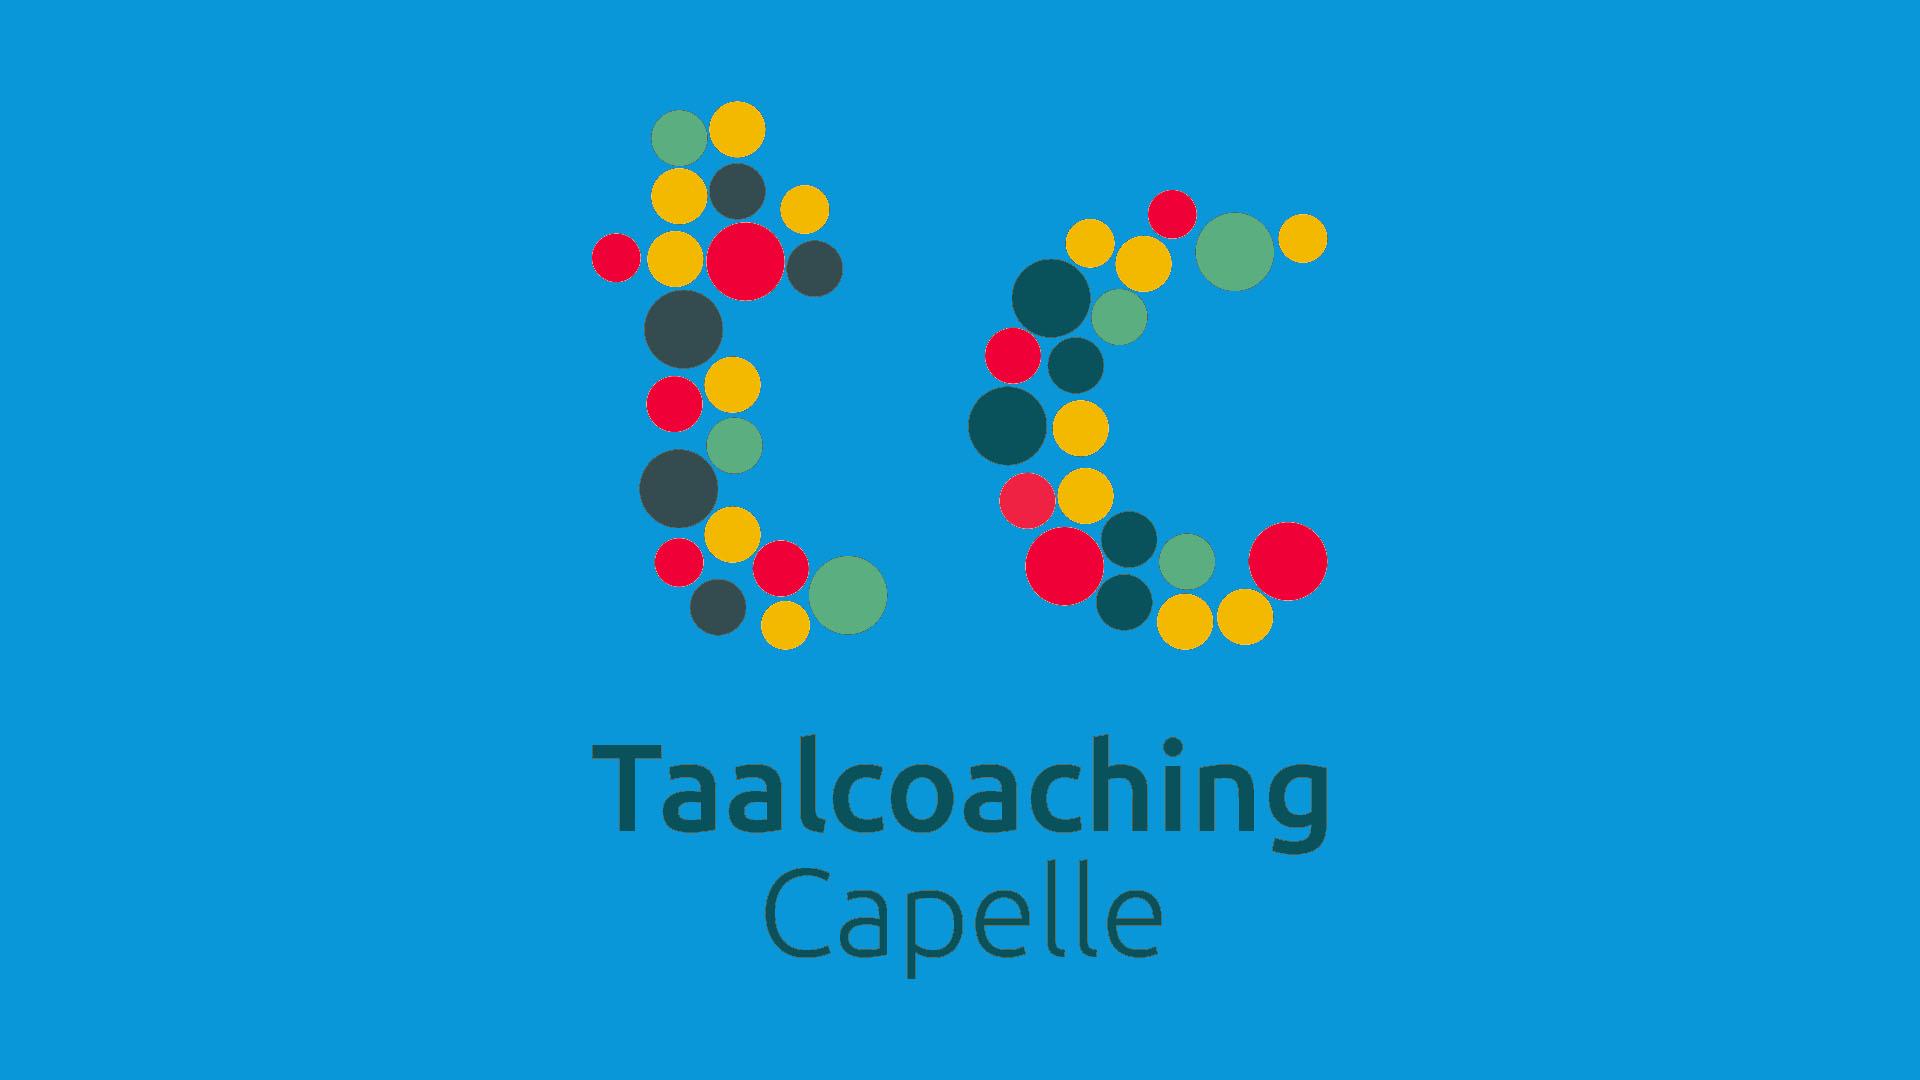 TC-openingsscherm